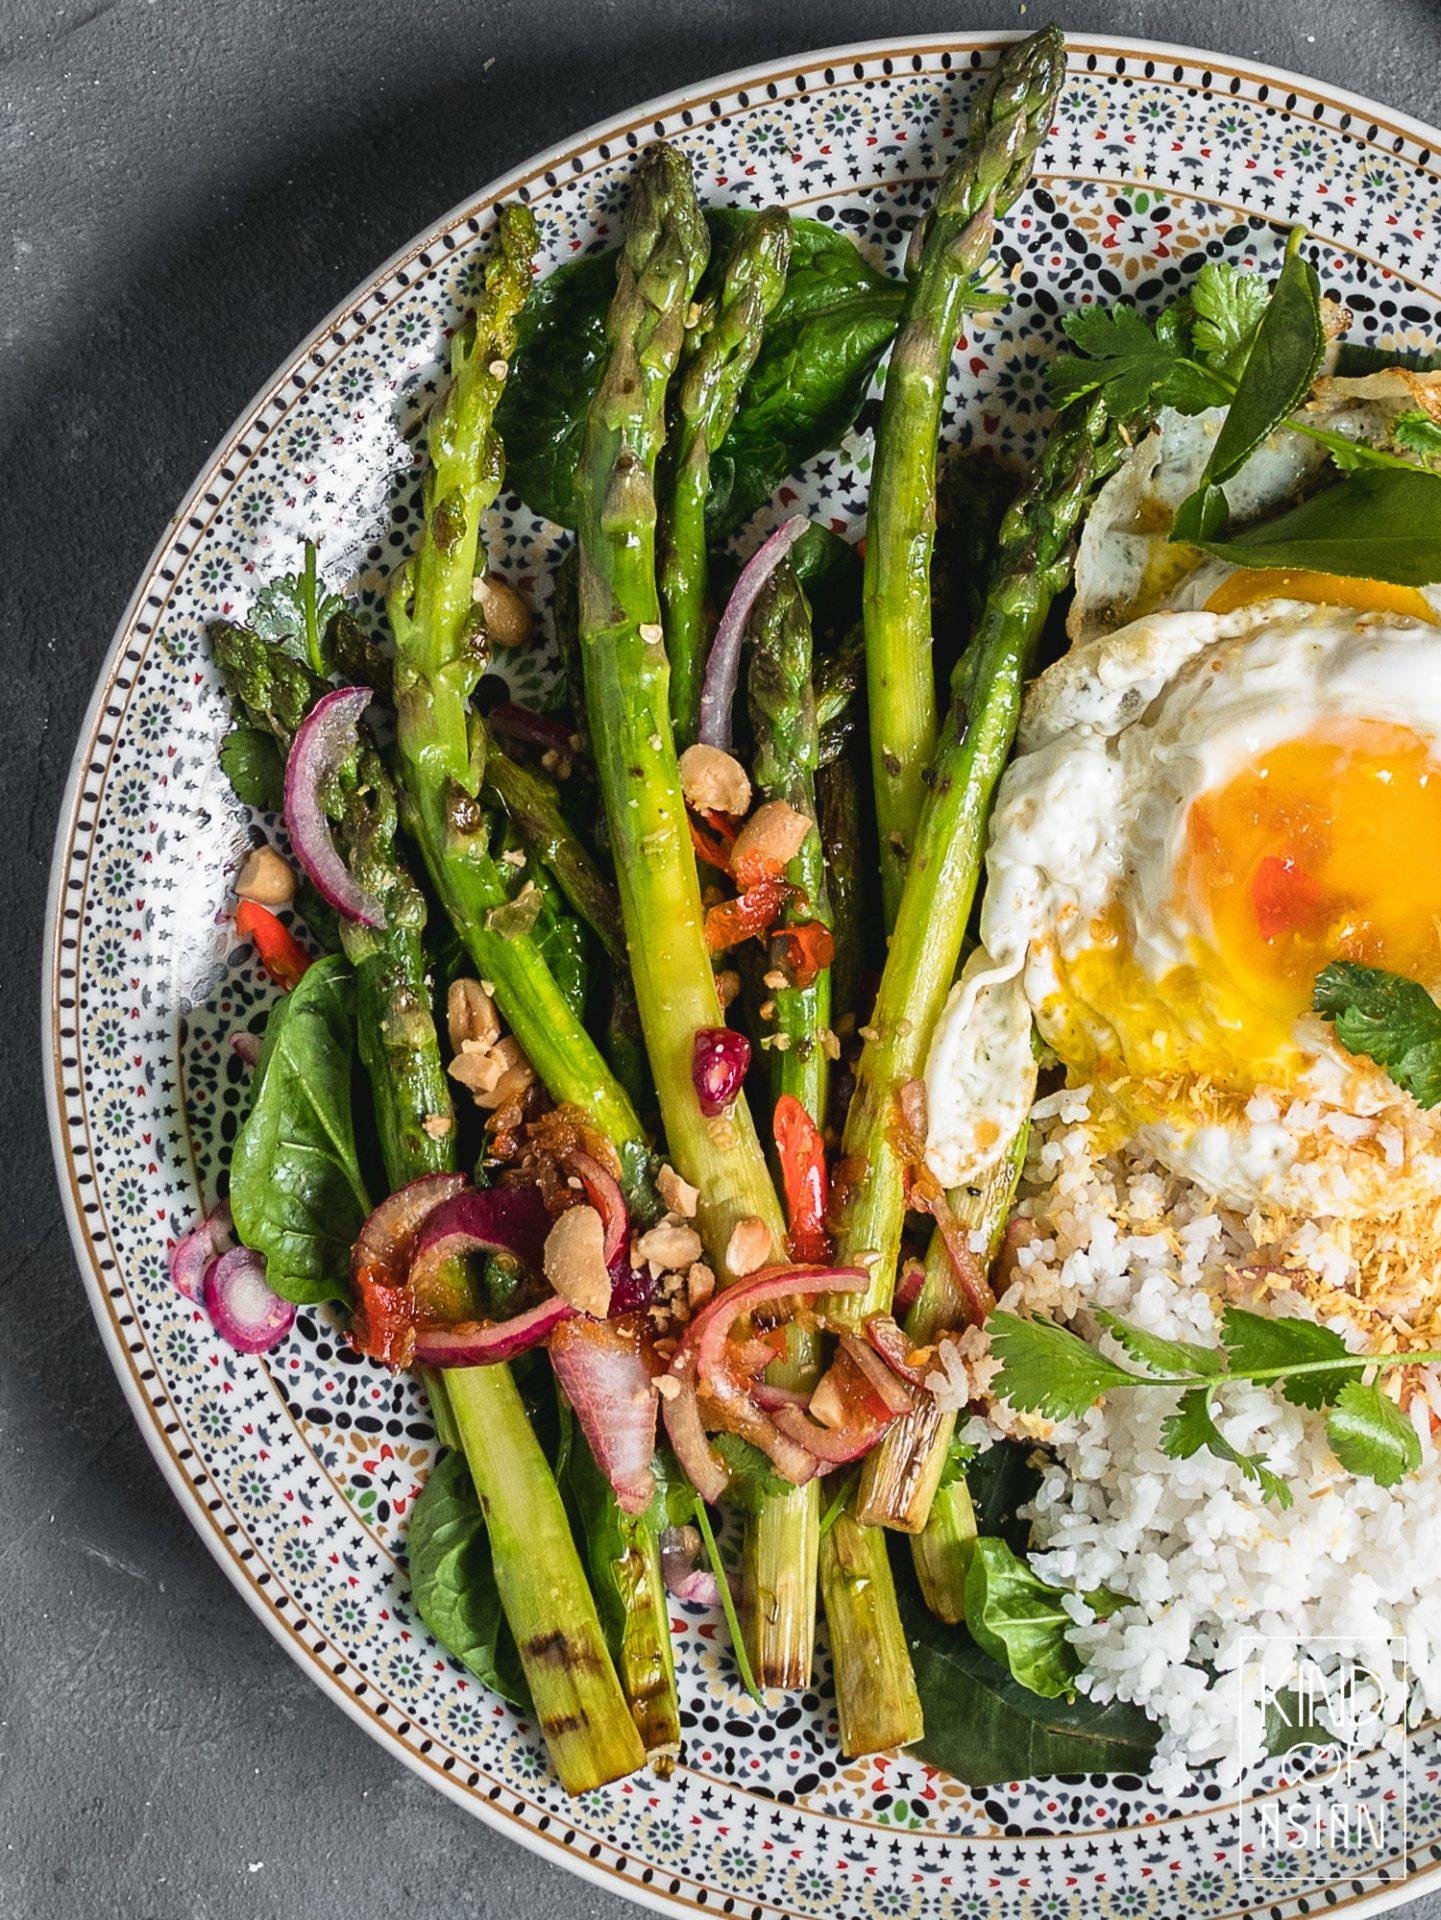 Groene asperges, rode ui, pinda's in pittige Thaise dressing, kokosrijst en spiegelei.